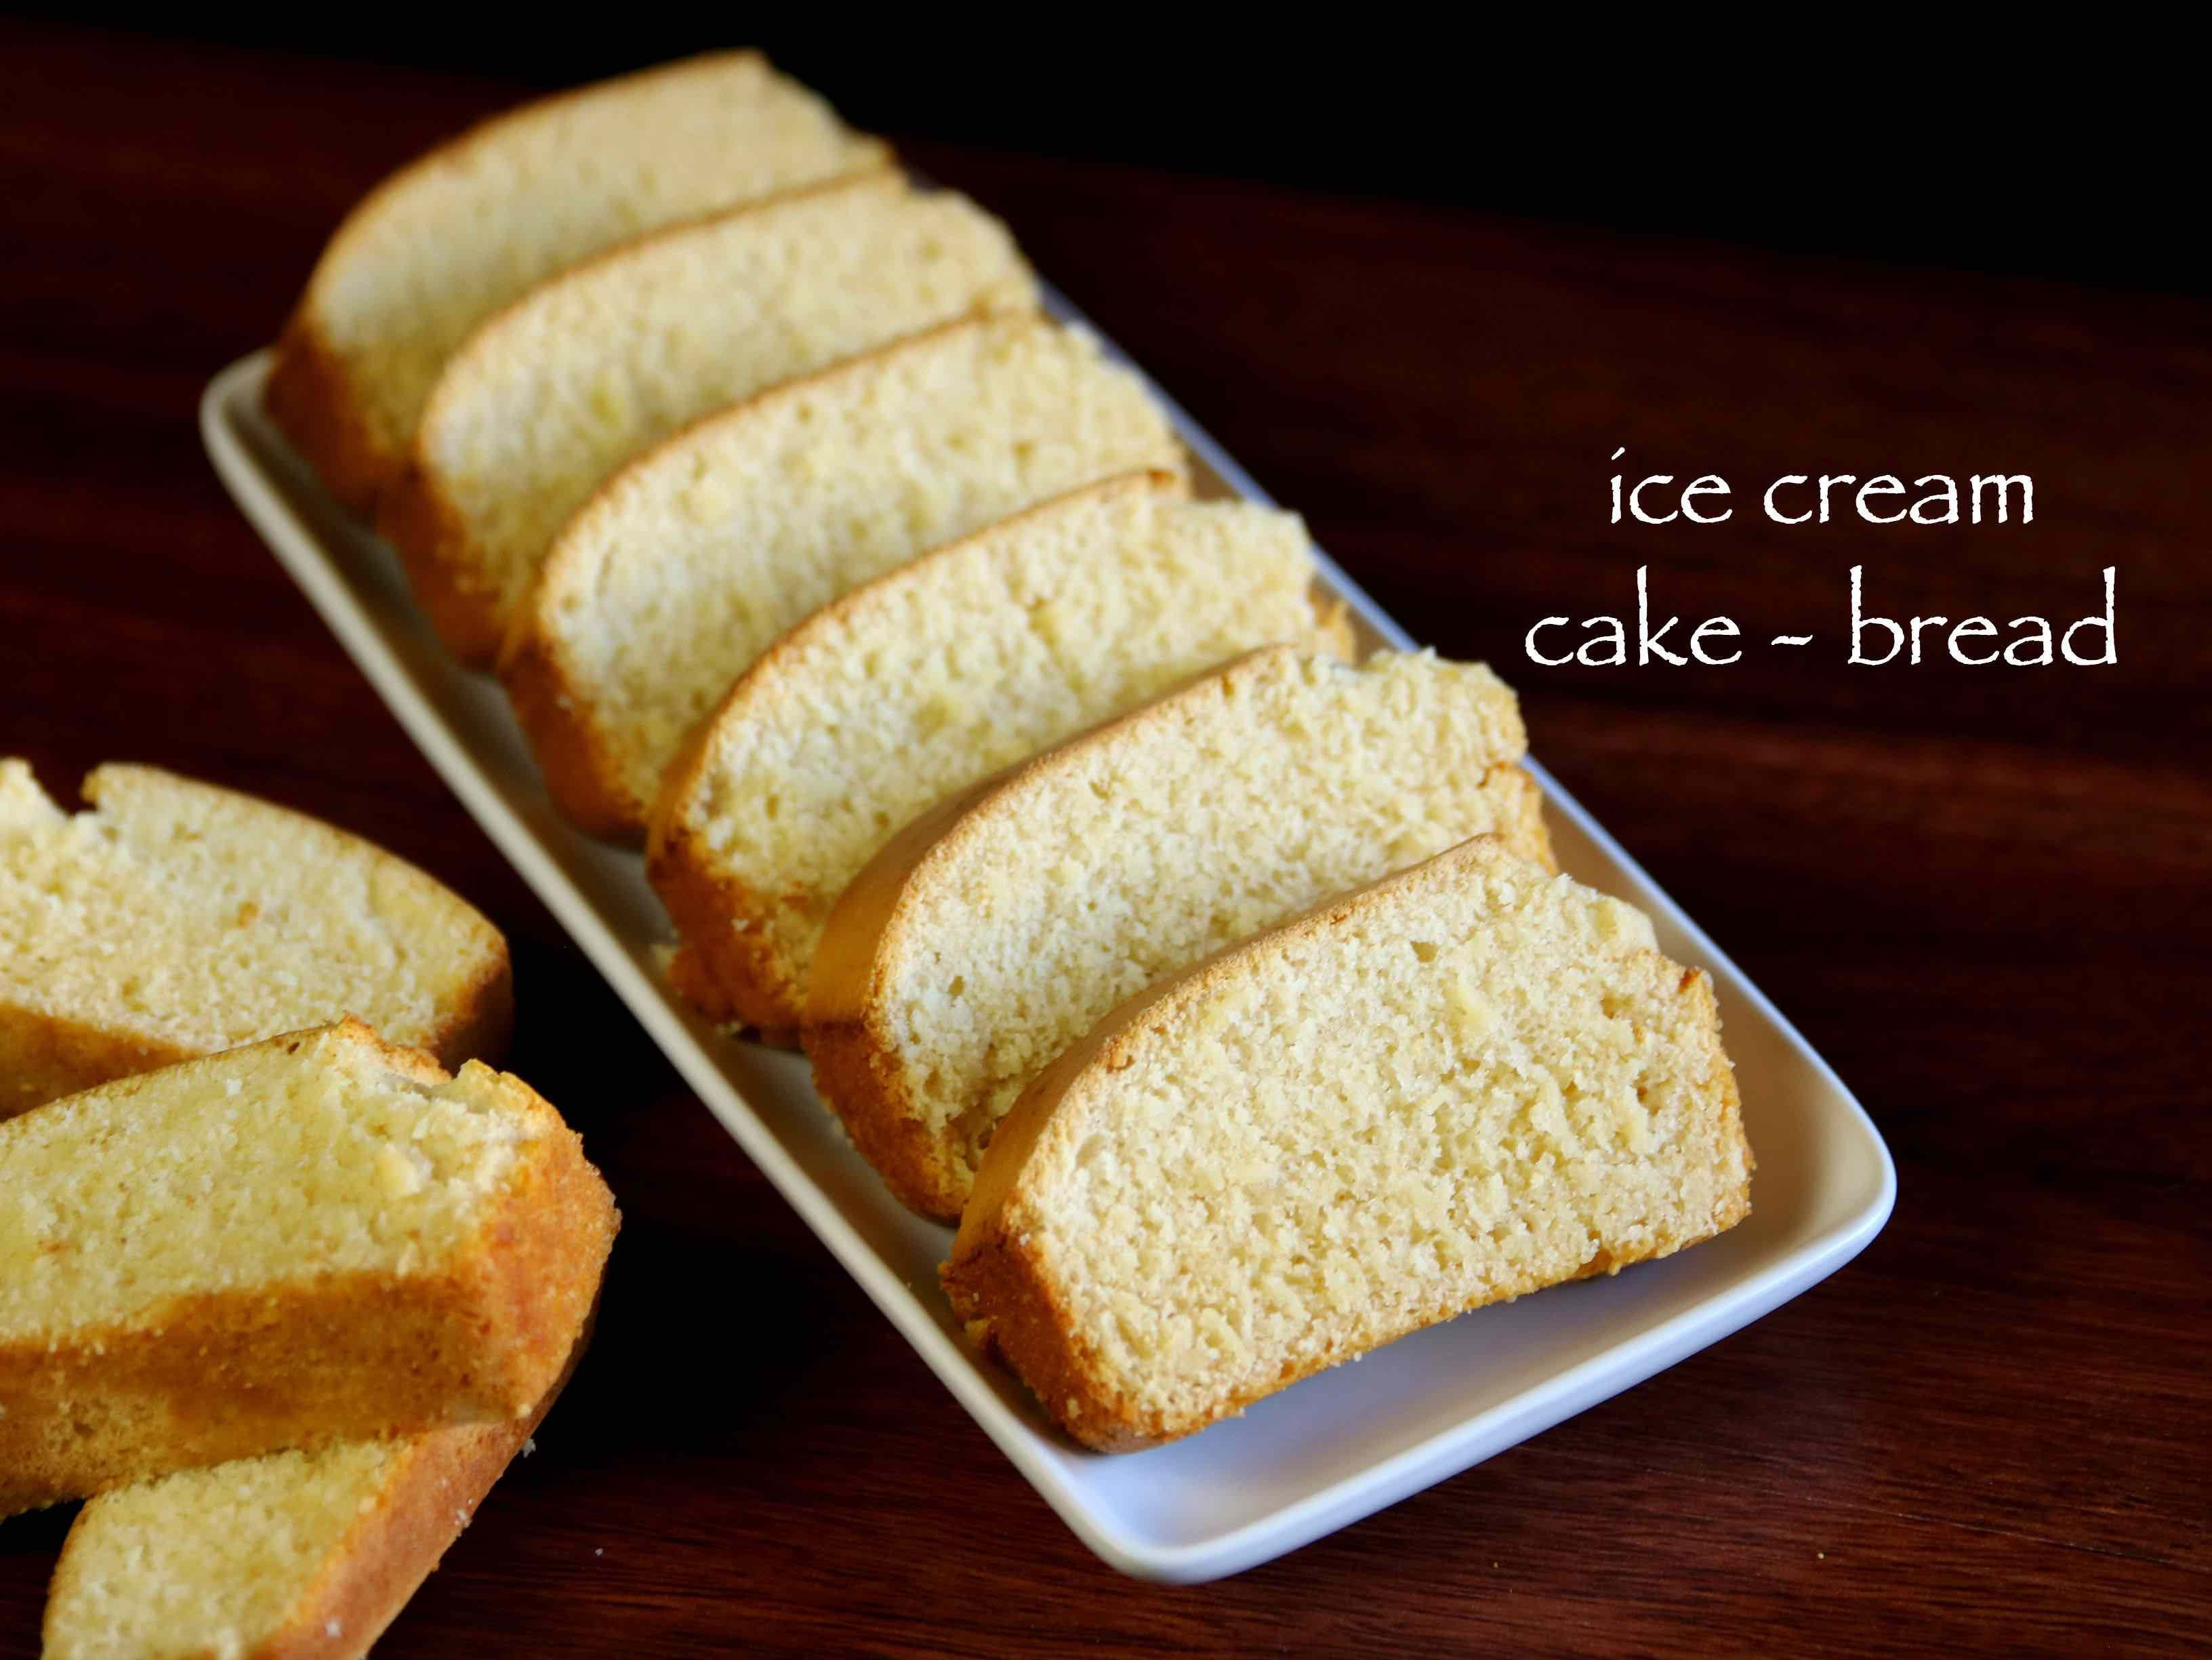 Vanilla Ice Cream Cake Recipe Ice Cream Bread With Step By Step